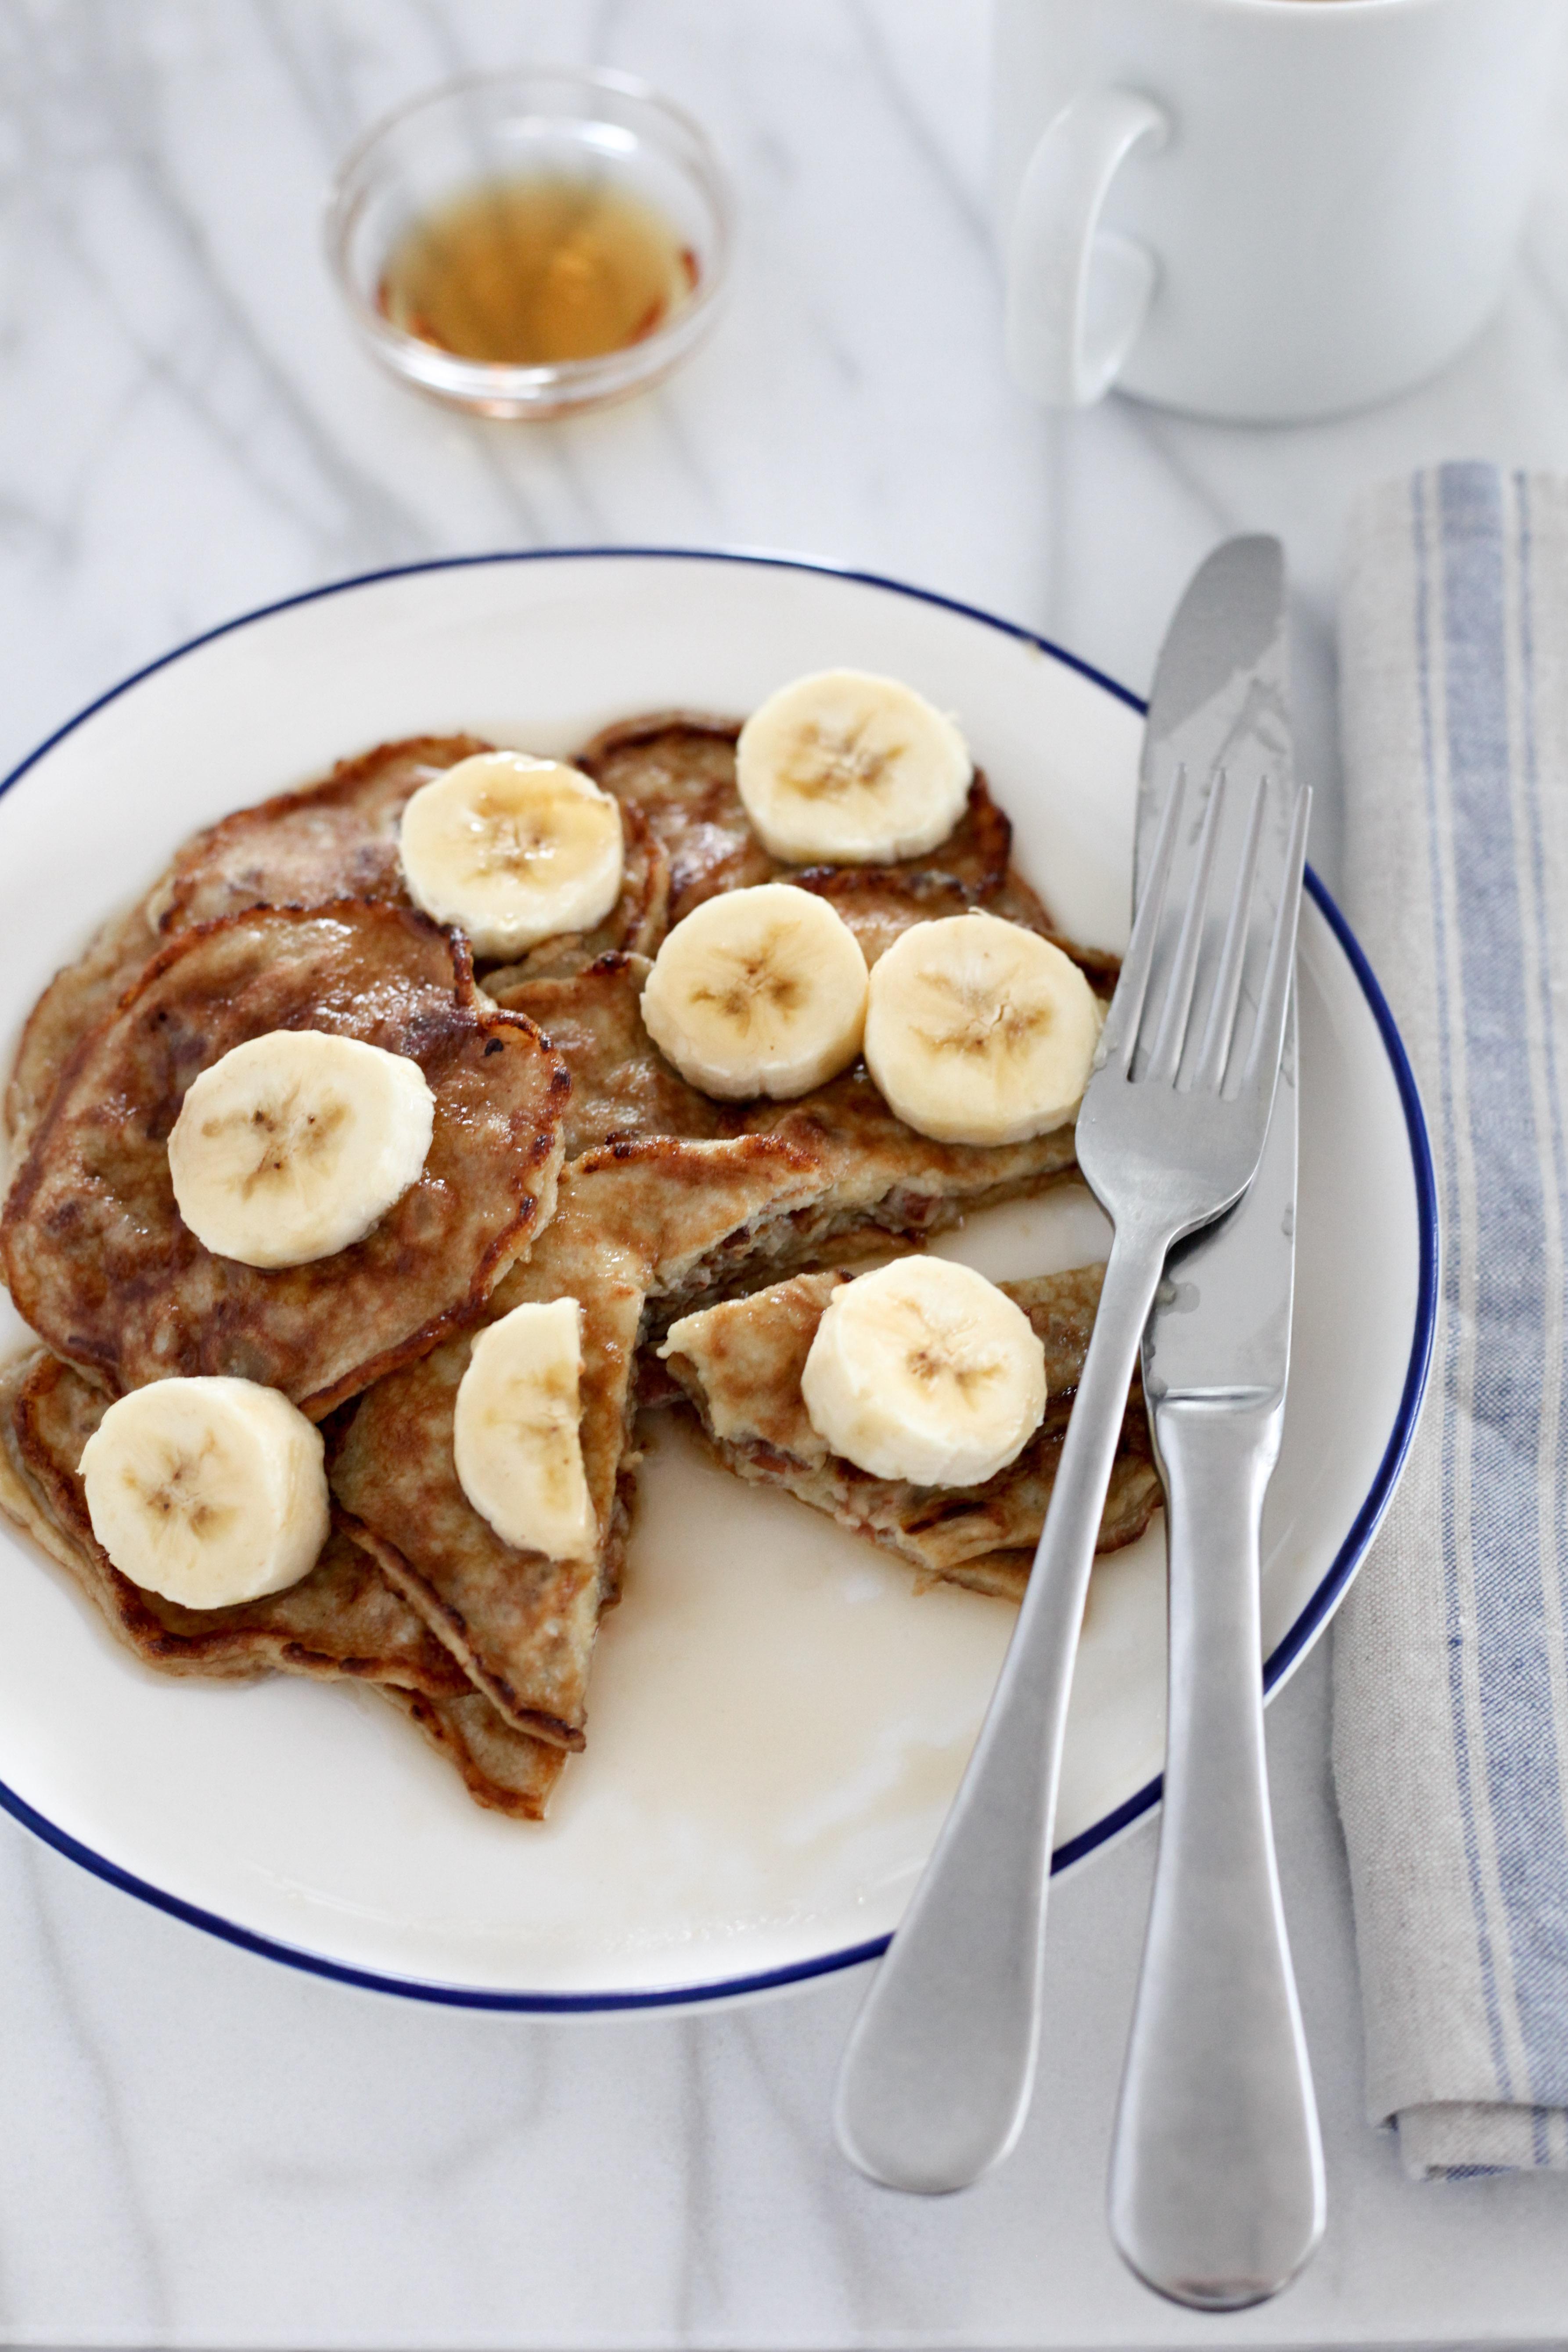 Grain-Free Banana-Pecan Paleo Pancakes | amodestfeast.com | @amodestfeast